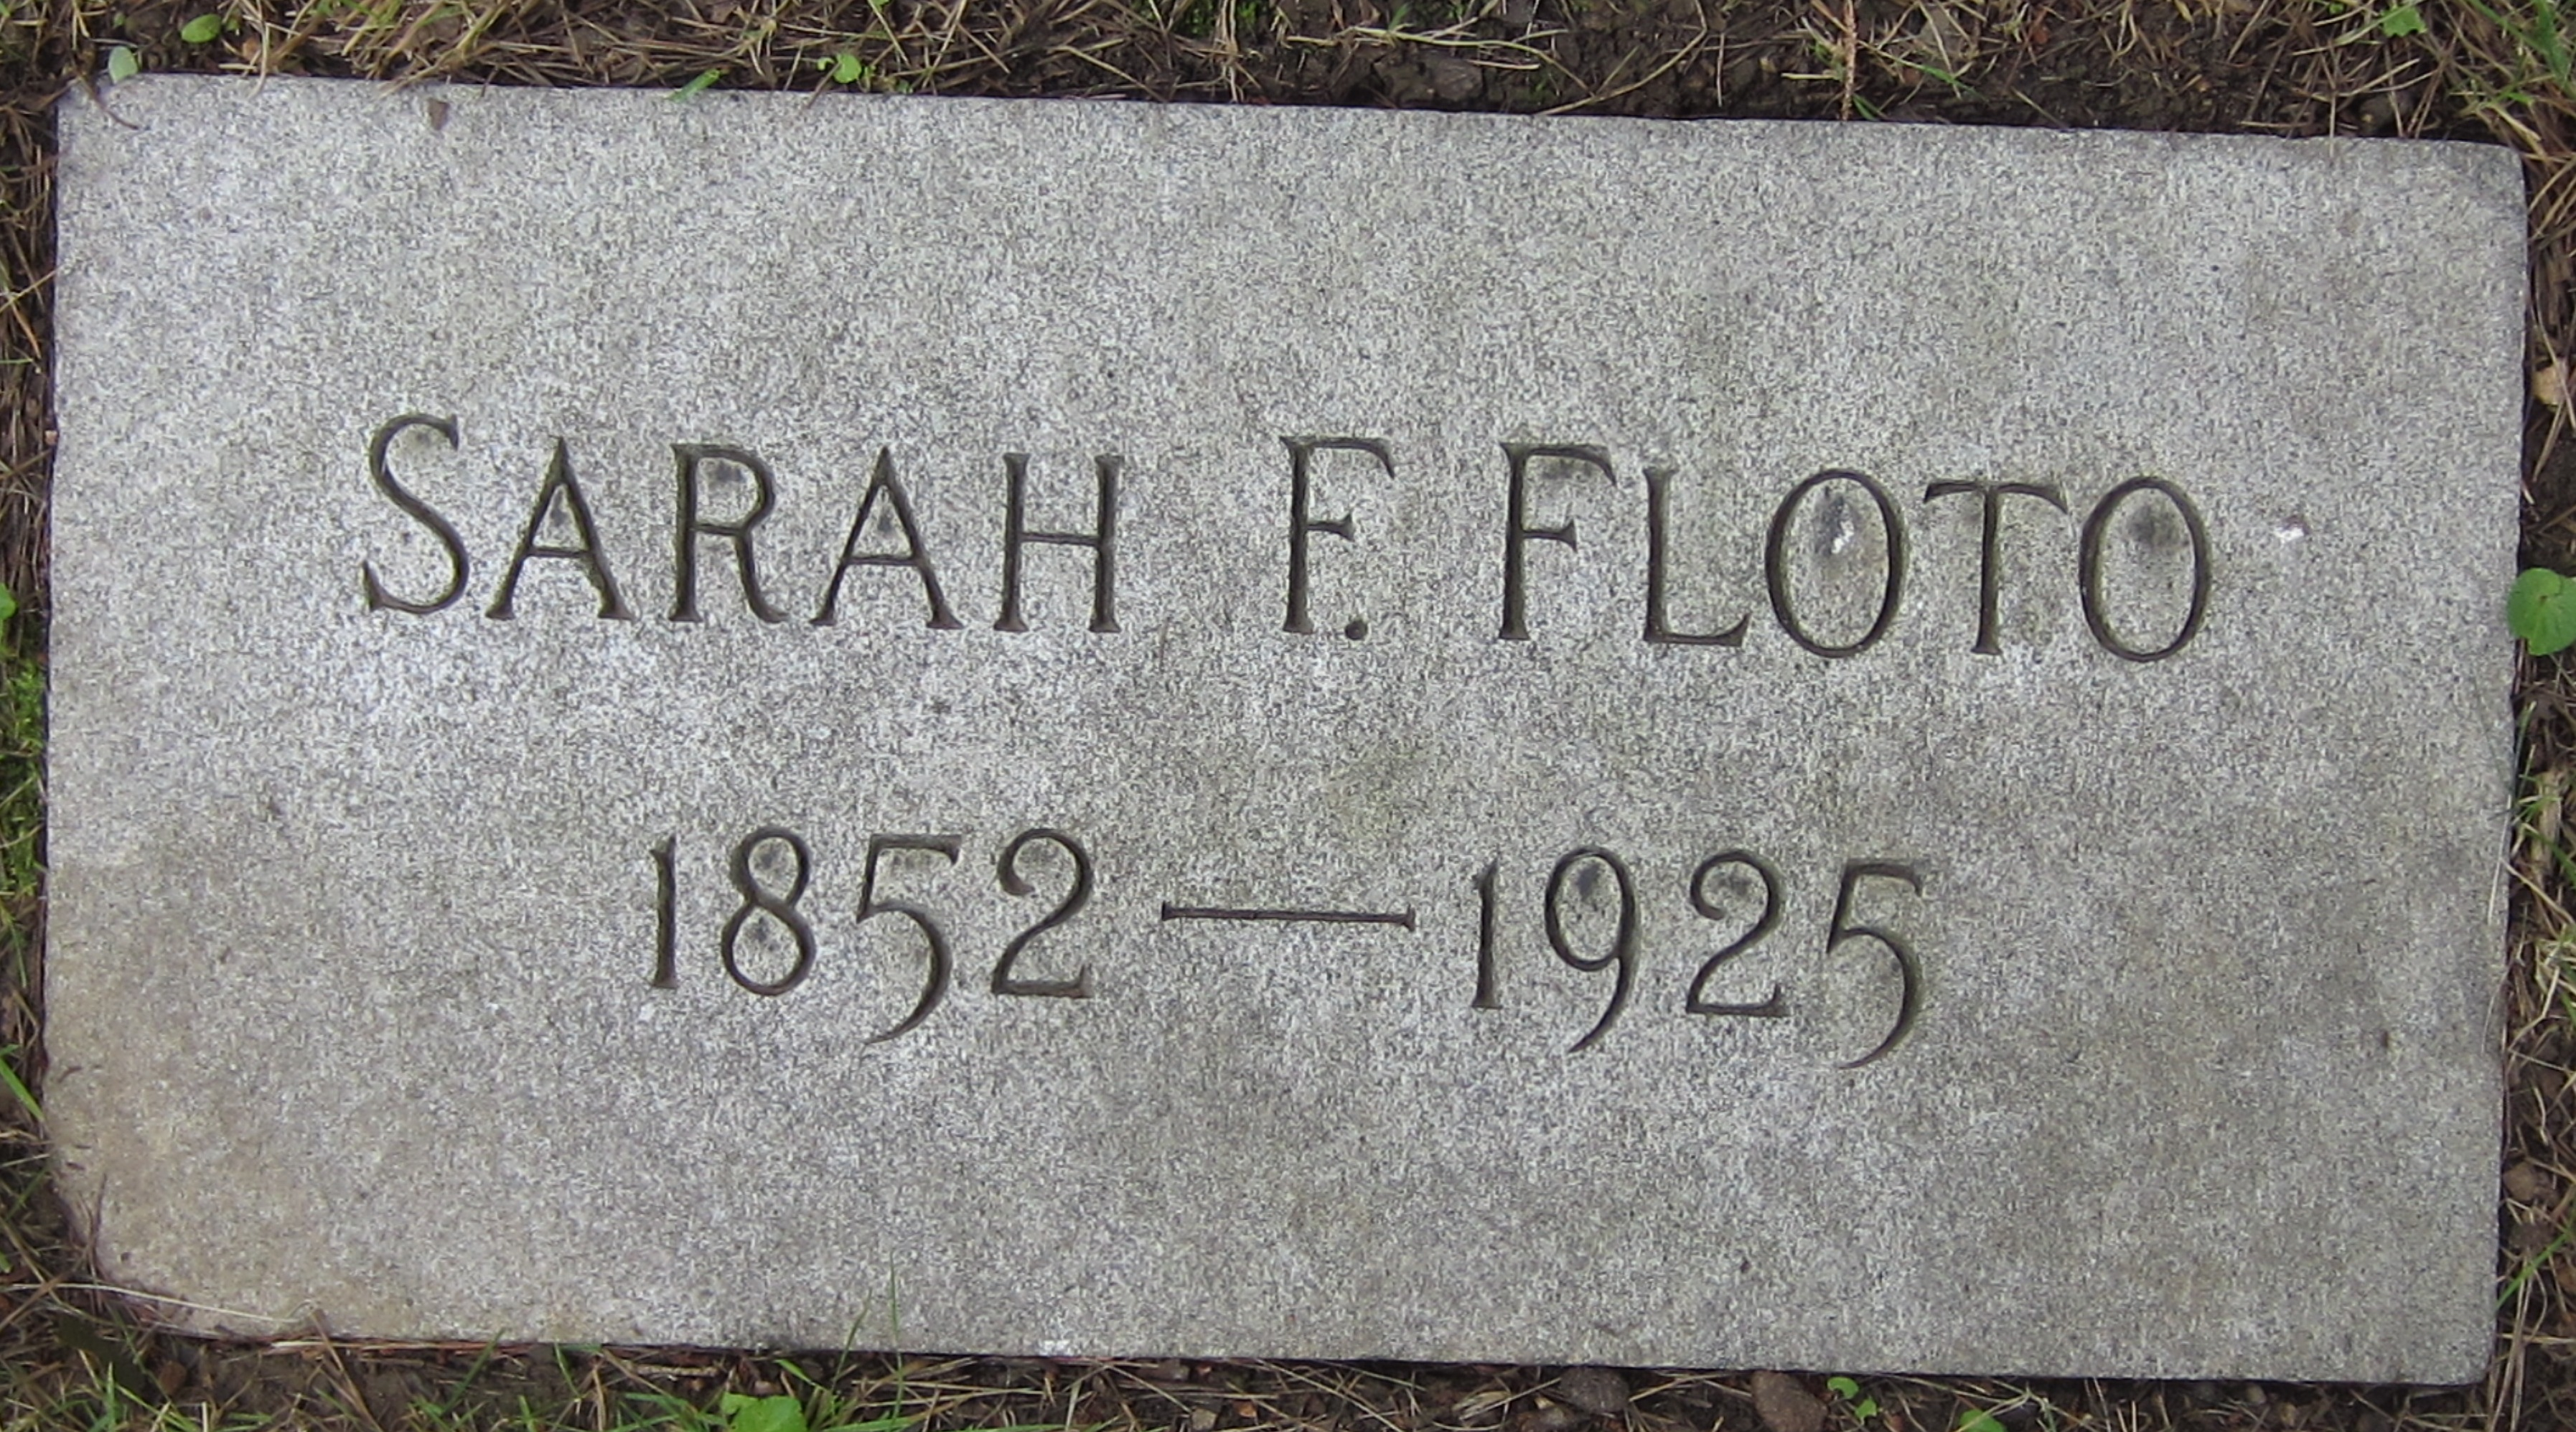 Sarah F. Floto